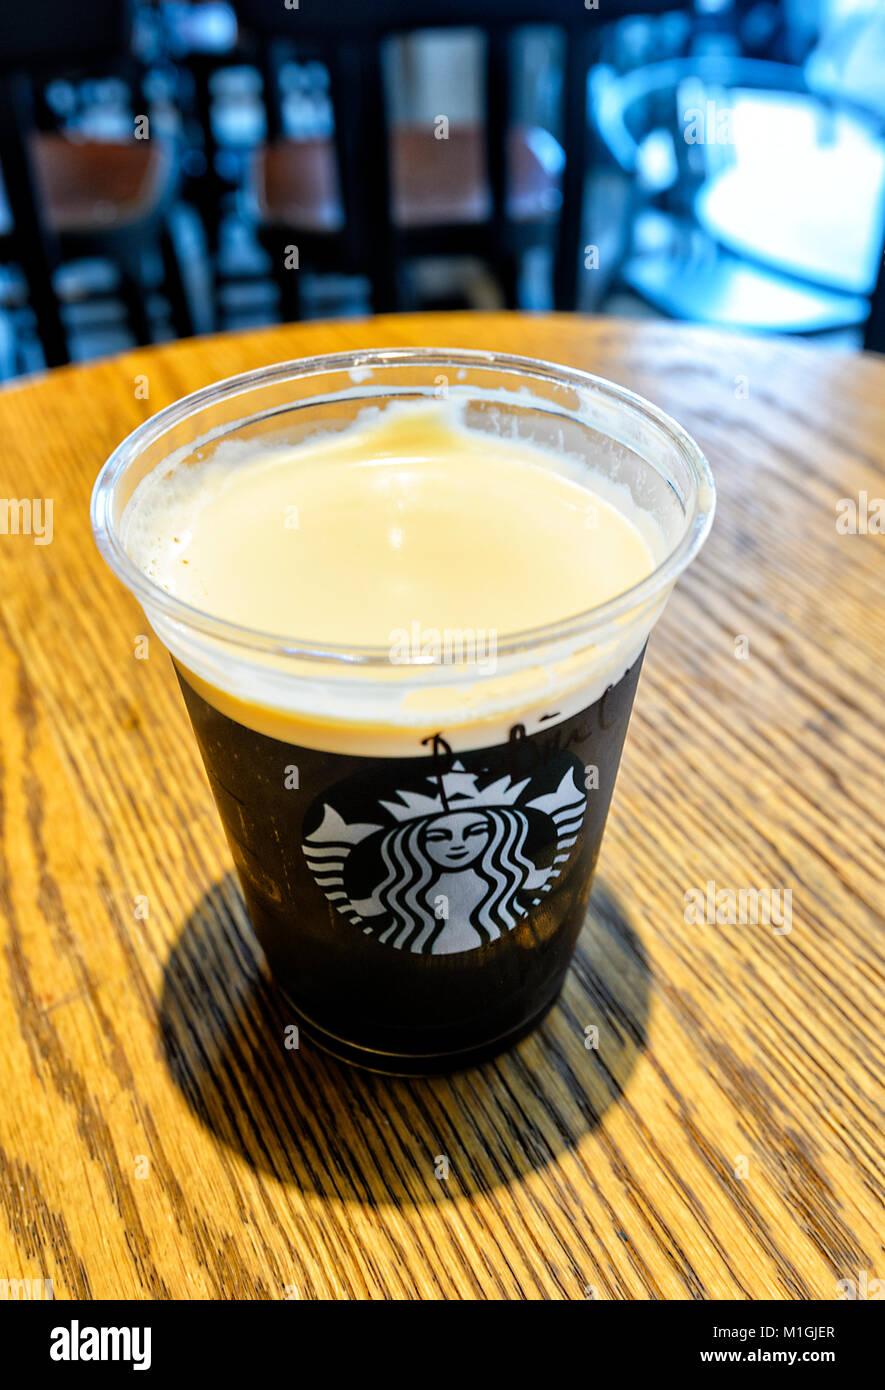 A plastic cup of Nitro Cold Brew Coffee at Starbucks, Kota Kinabalu, Sabah, Borneo, Malaysia - Stock Image